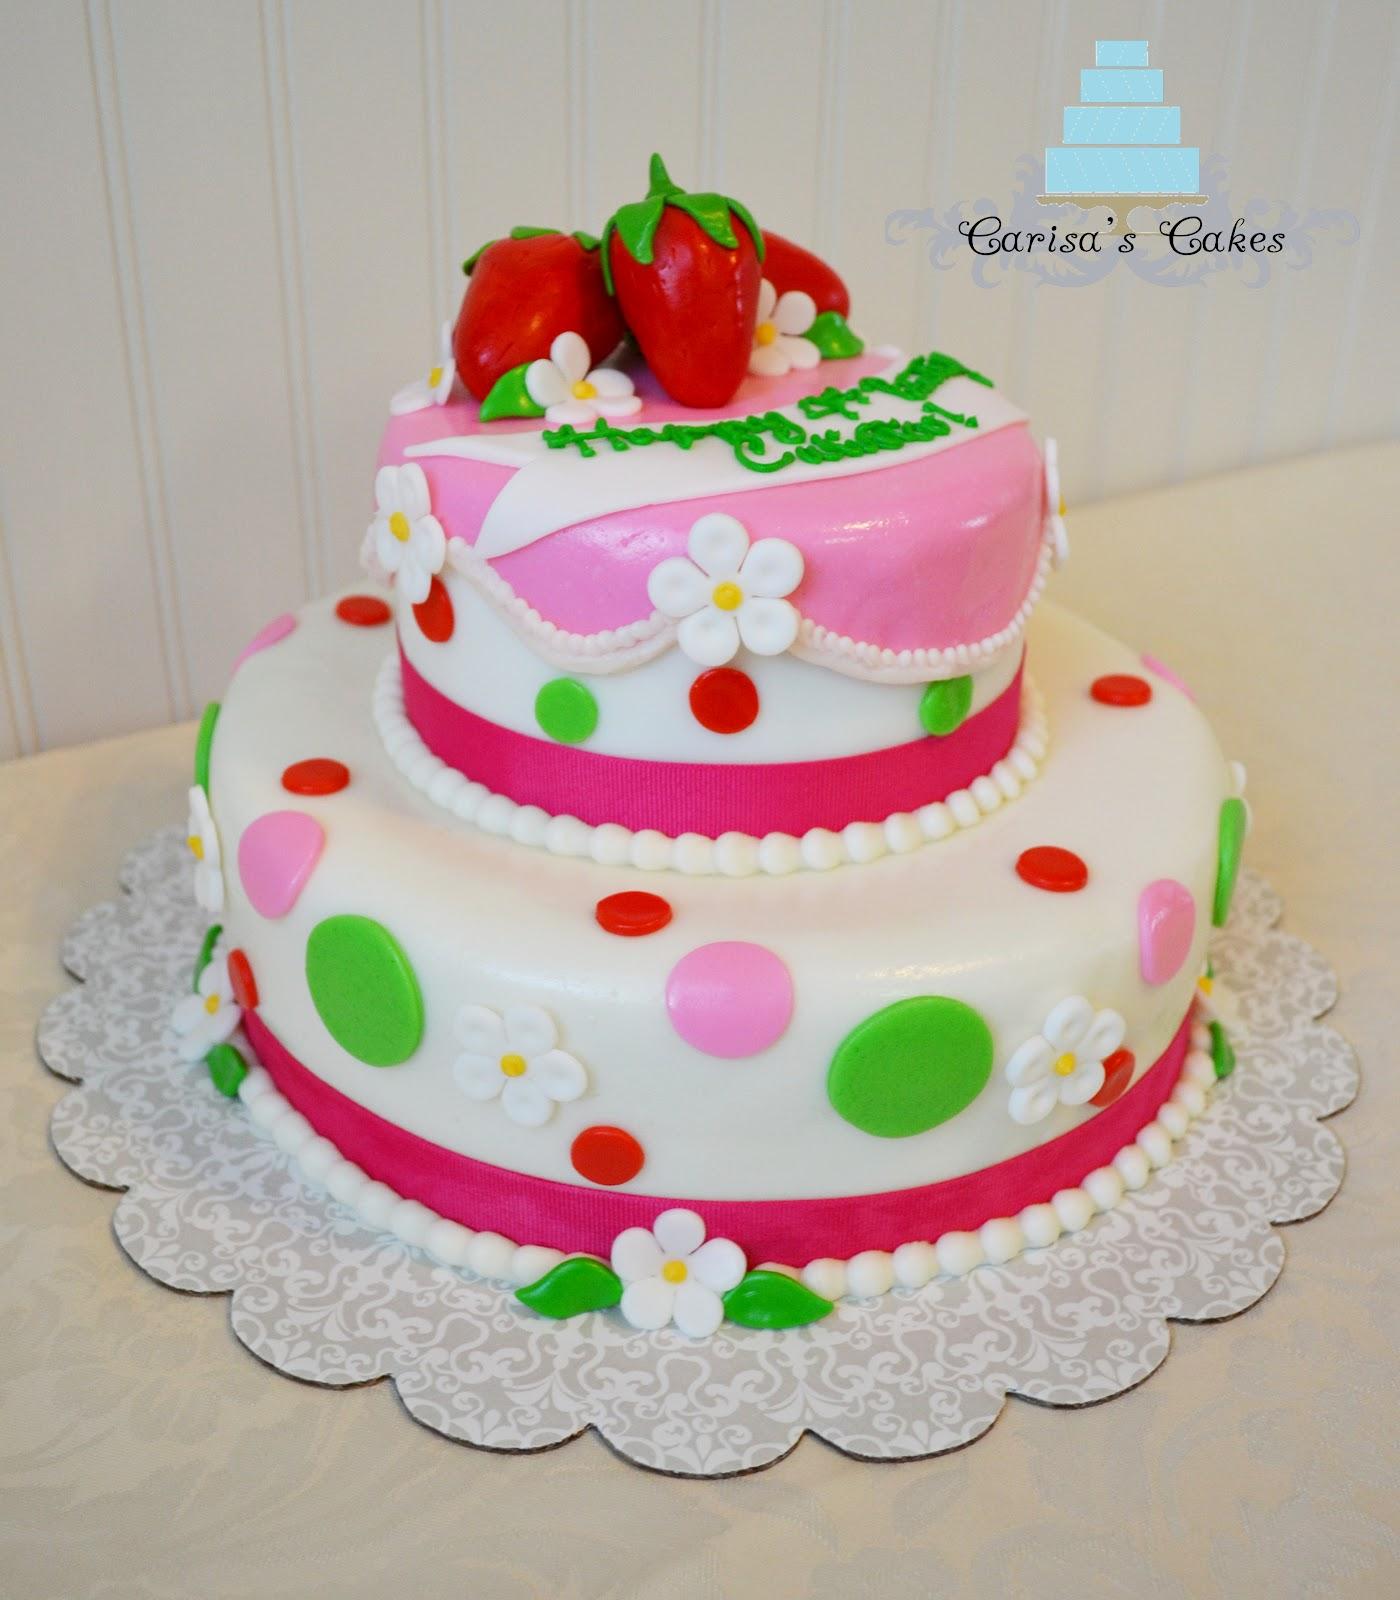 Carisa's Cakes: Strawberry Shortcake Birthday